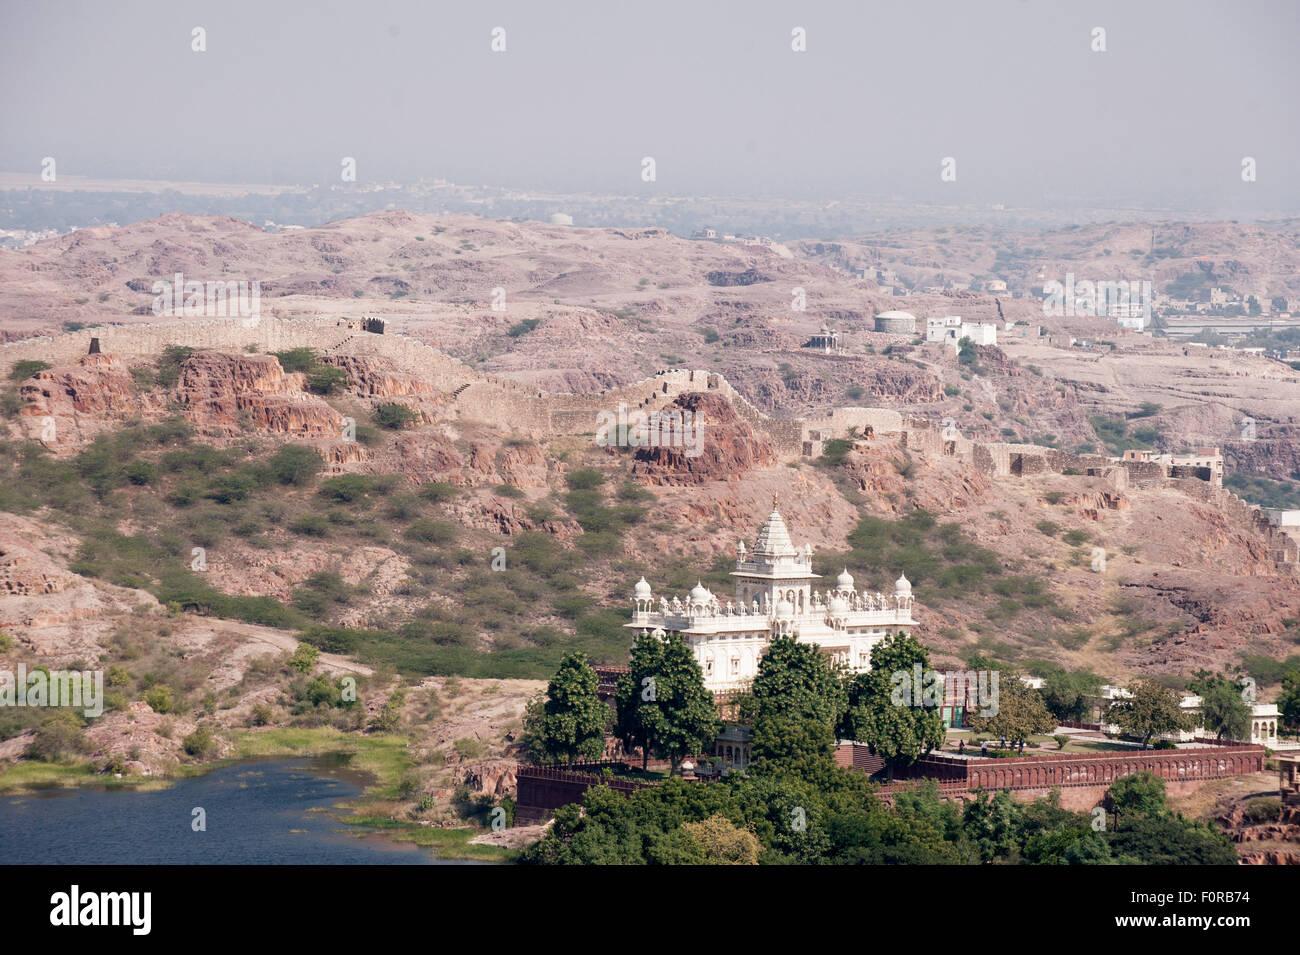 Jodhpur, India. Jaswant Thada  mausoleum. White marble cenotaph, in memory of the Maharaja. Arid landscape. - Stock Image